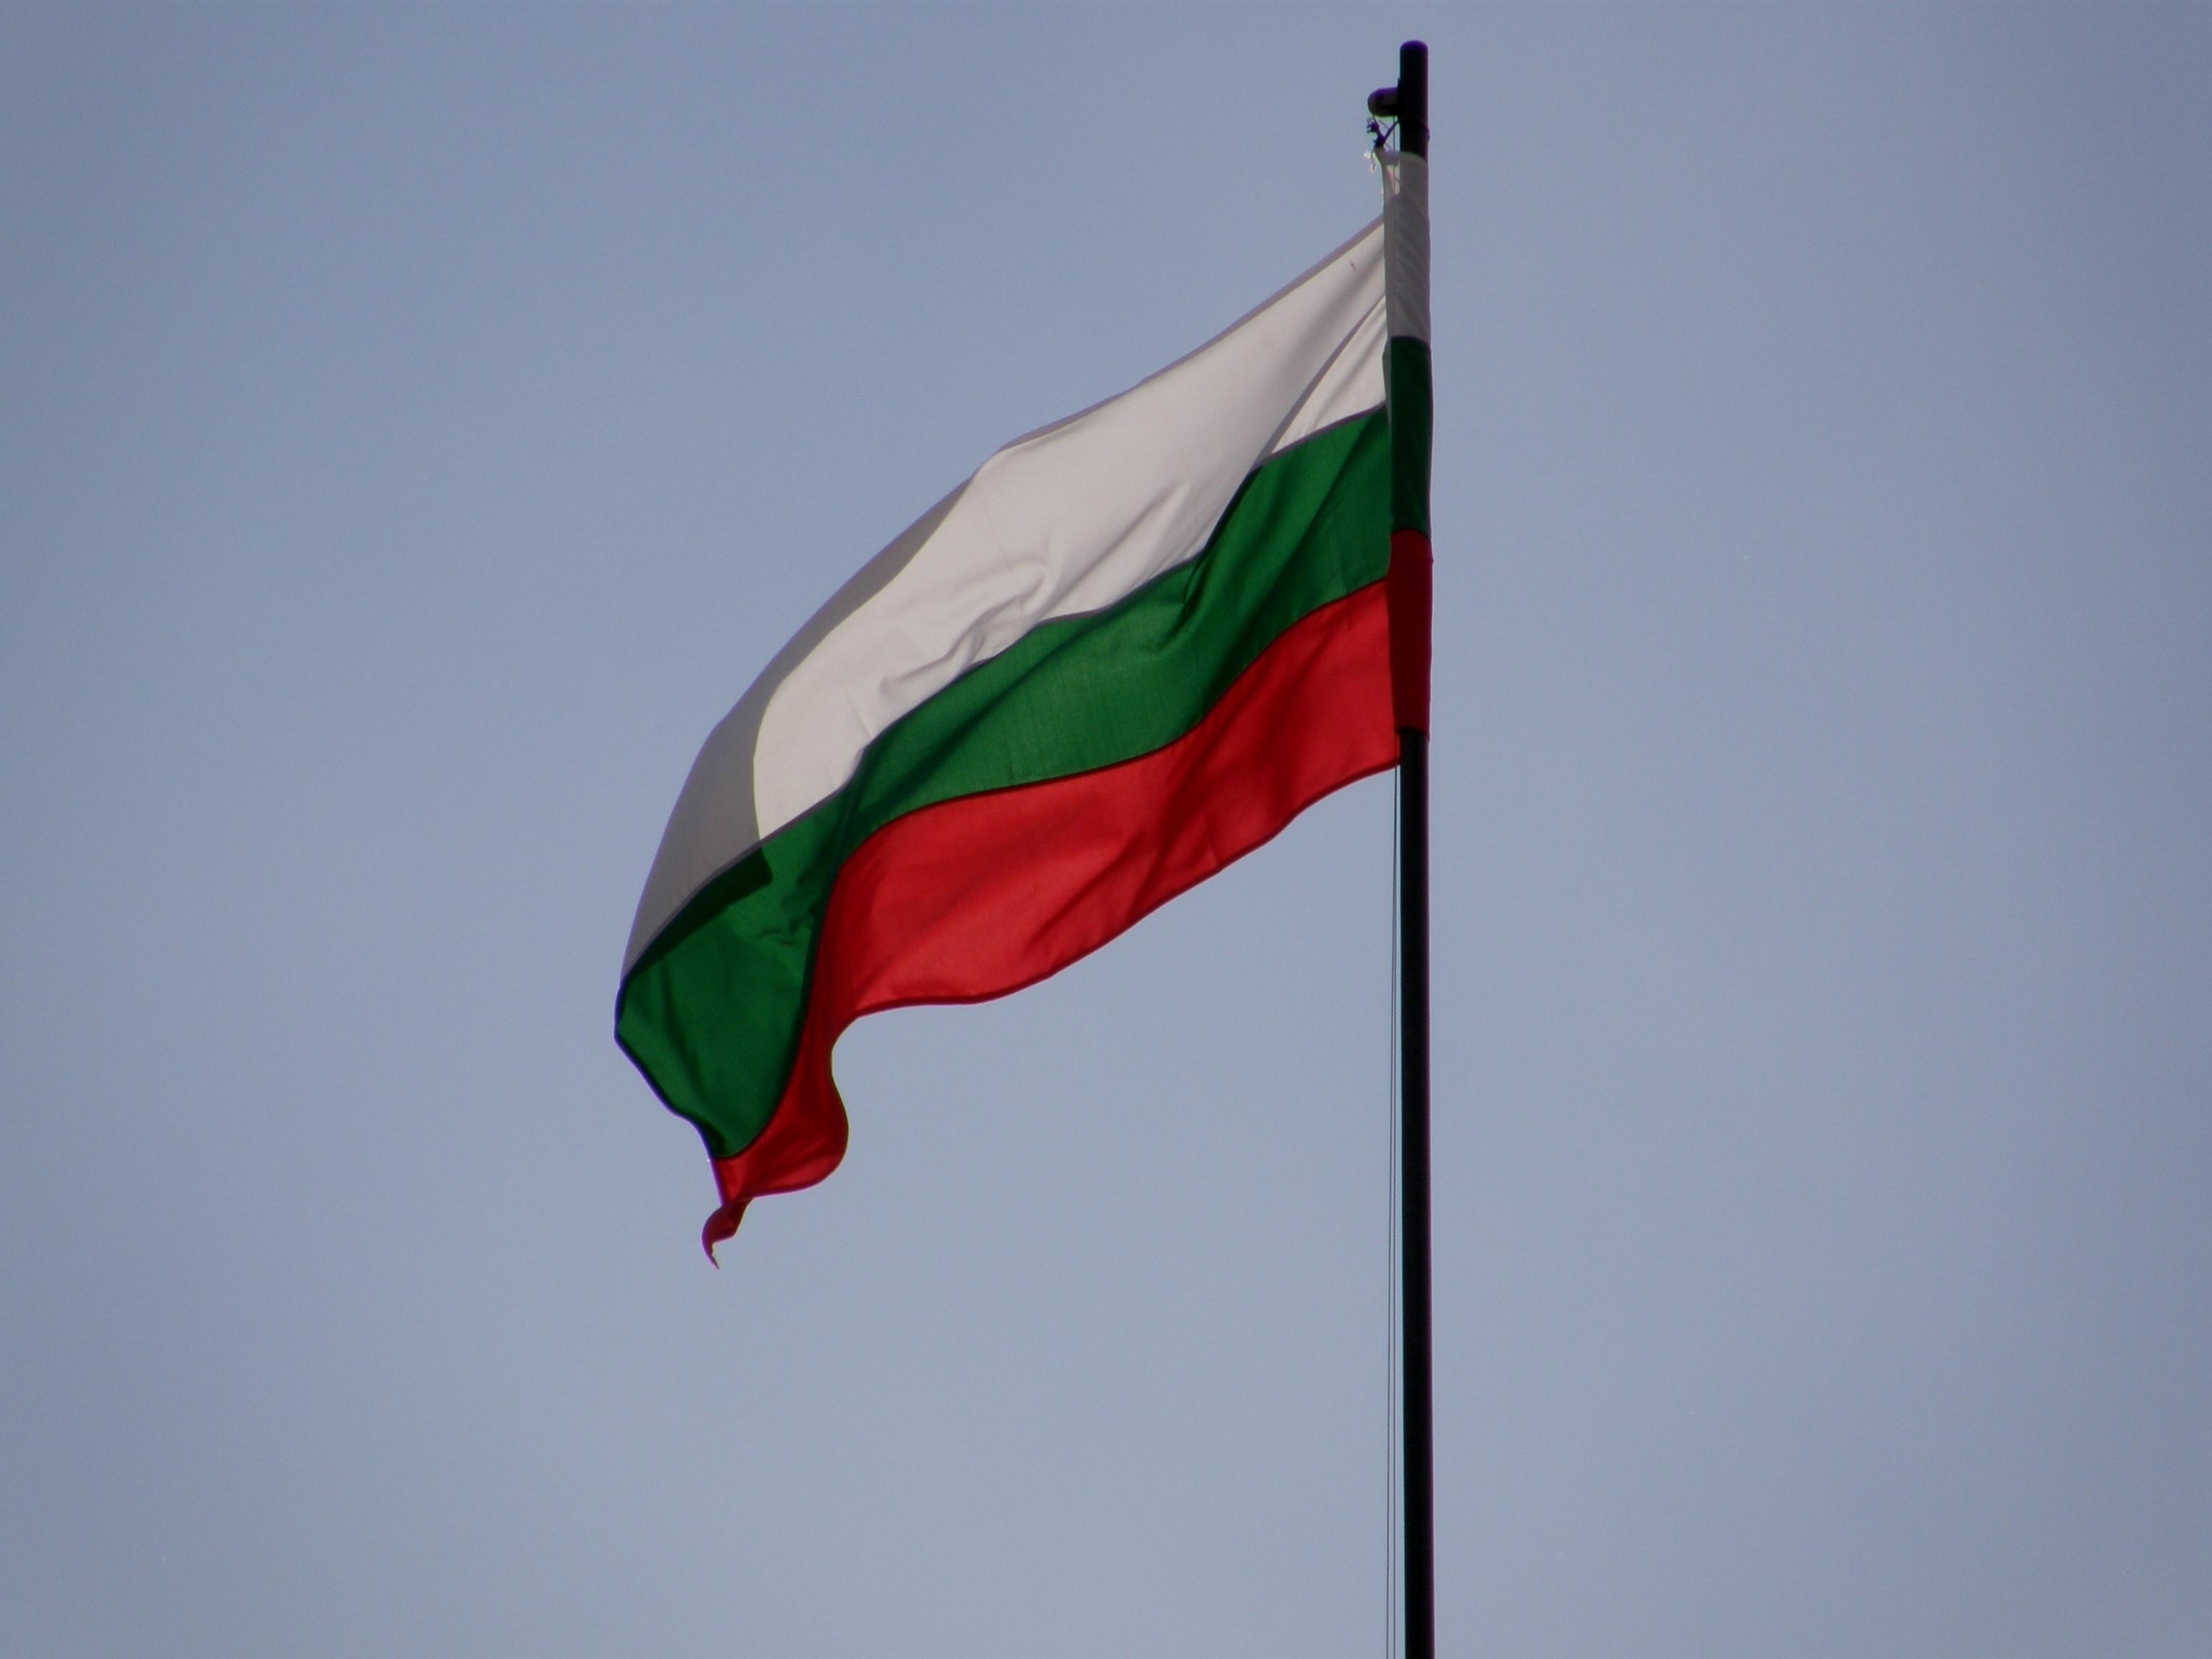 https://upload.wikimedia.org/wikipedia/commons/e/e0/Bulgarian_flag_%281%29.jpg